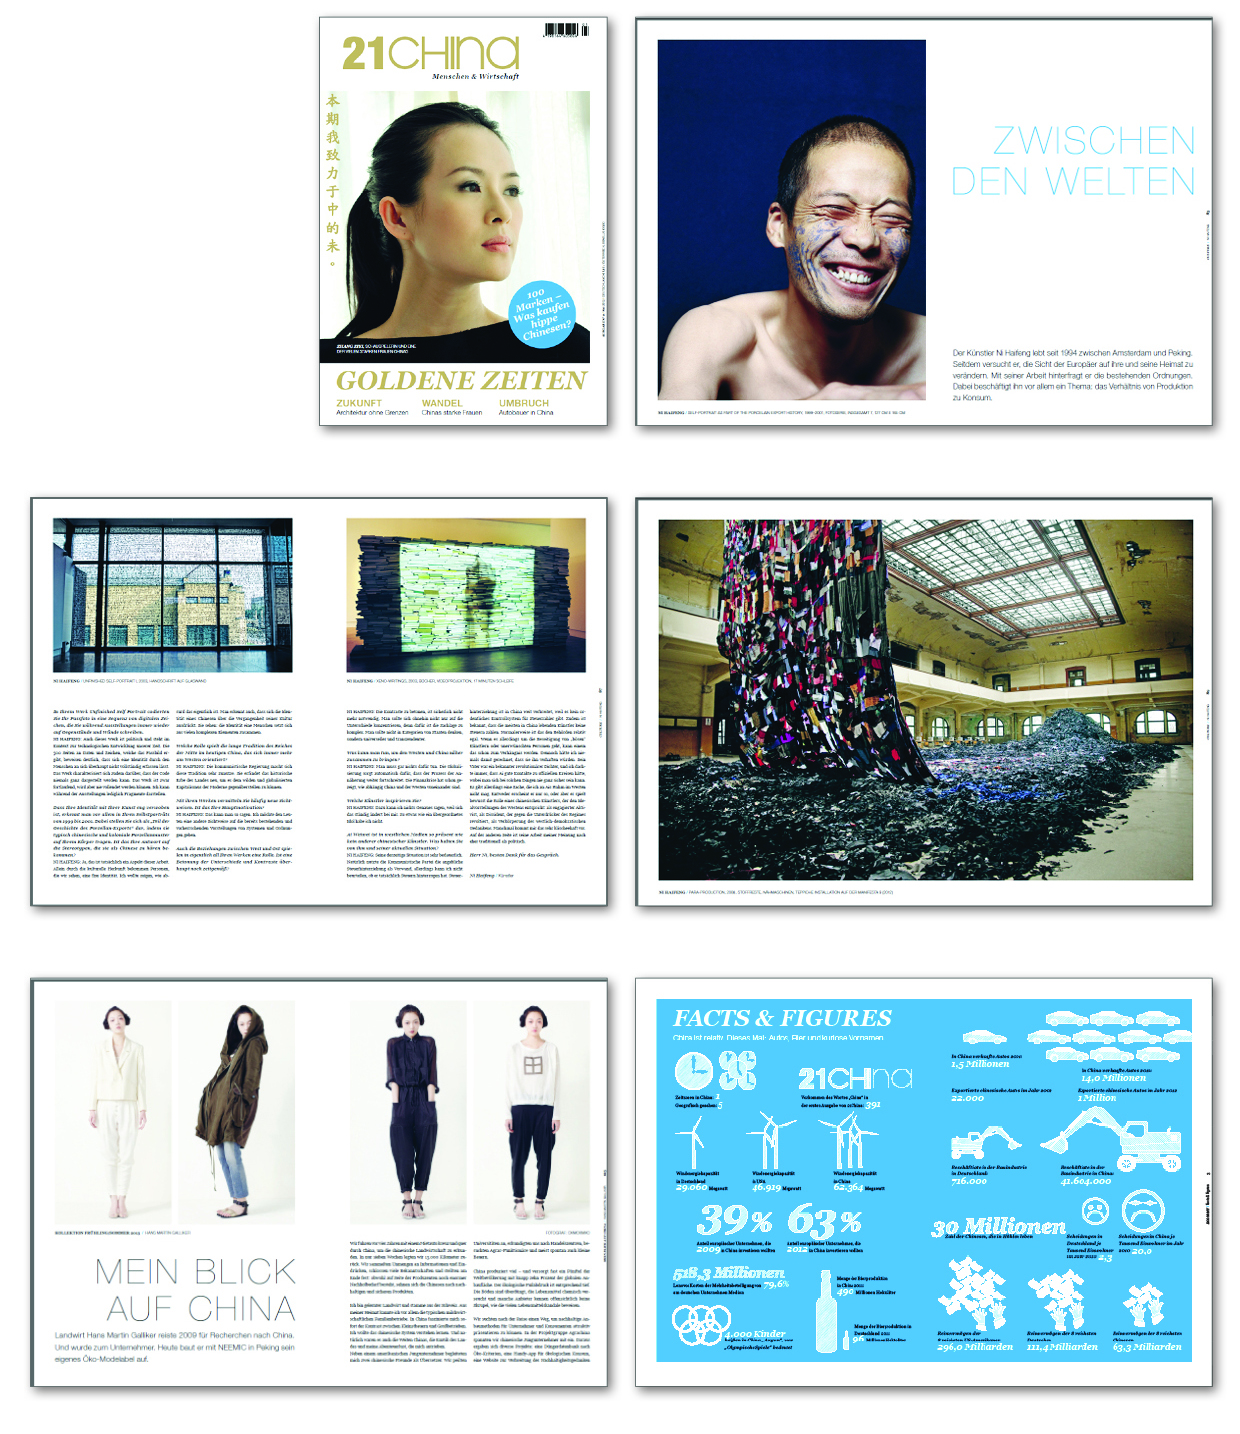 Mappe_Bibo_2013_Zeitschriften_V14